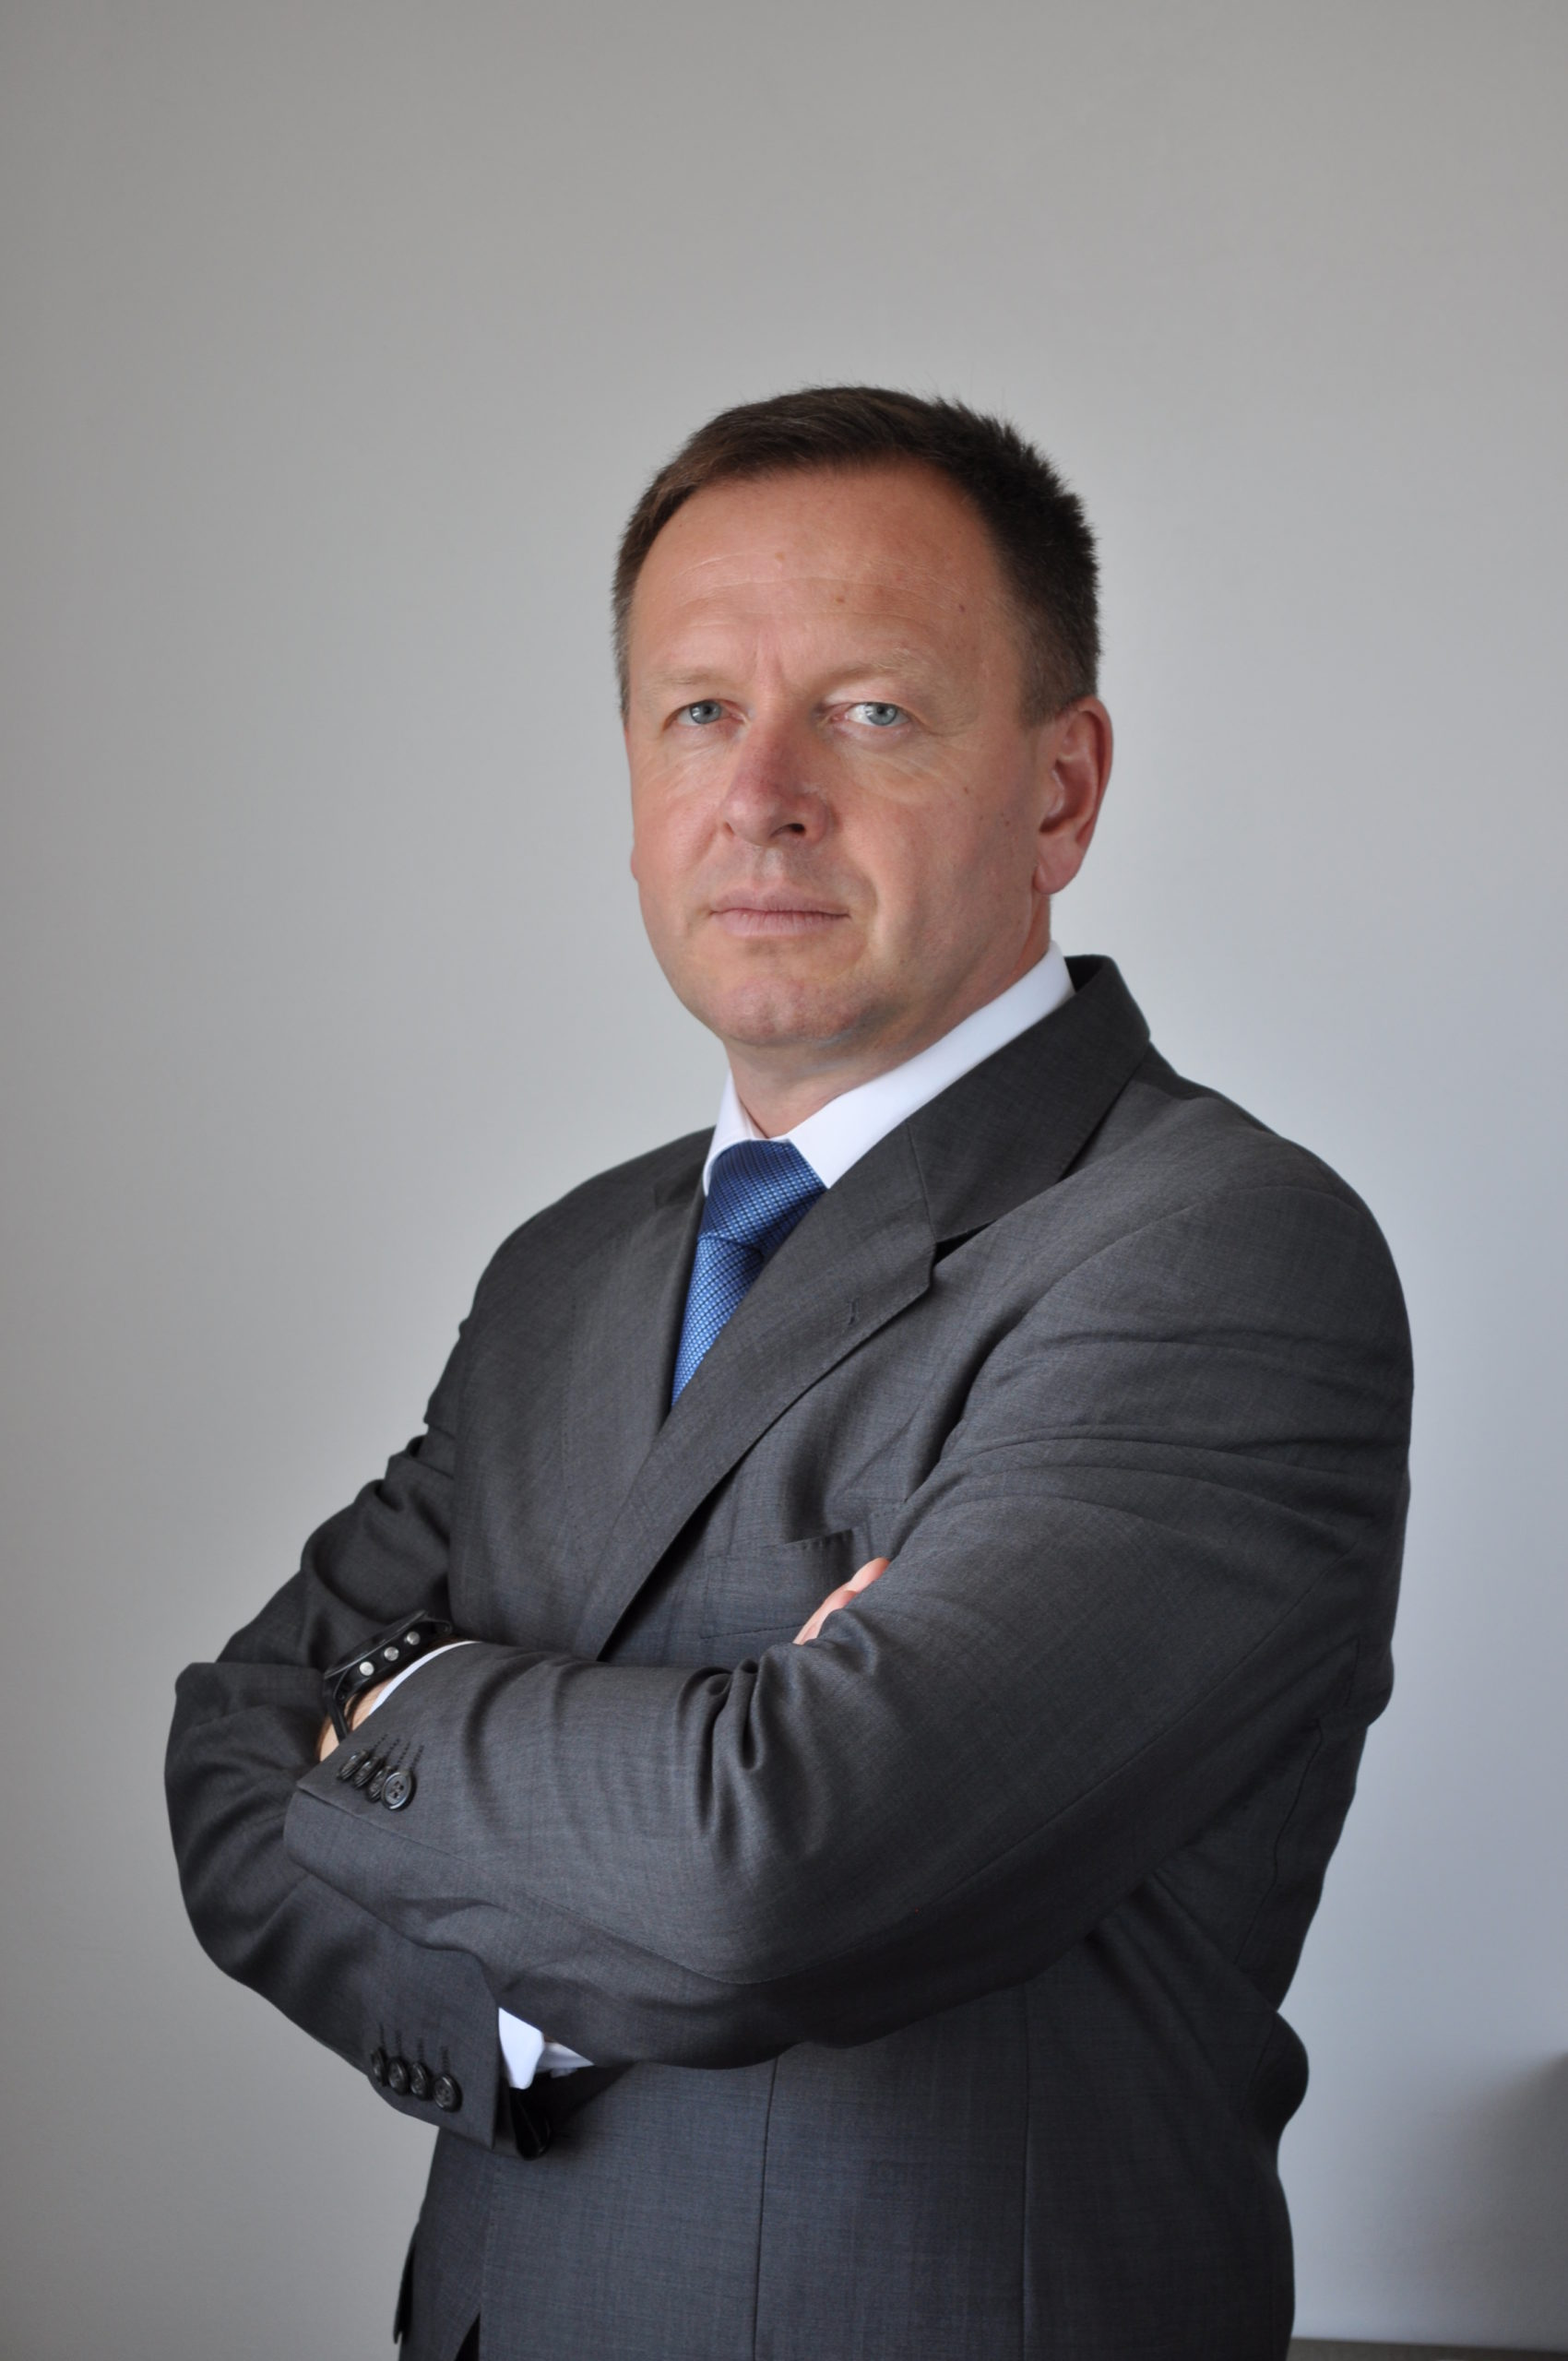 Predsednik Komisije dr. Robert Šumi